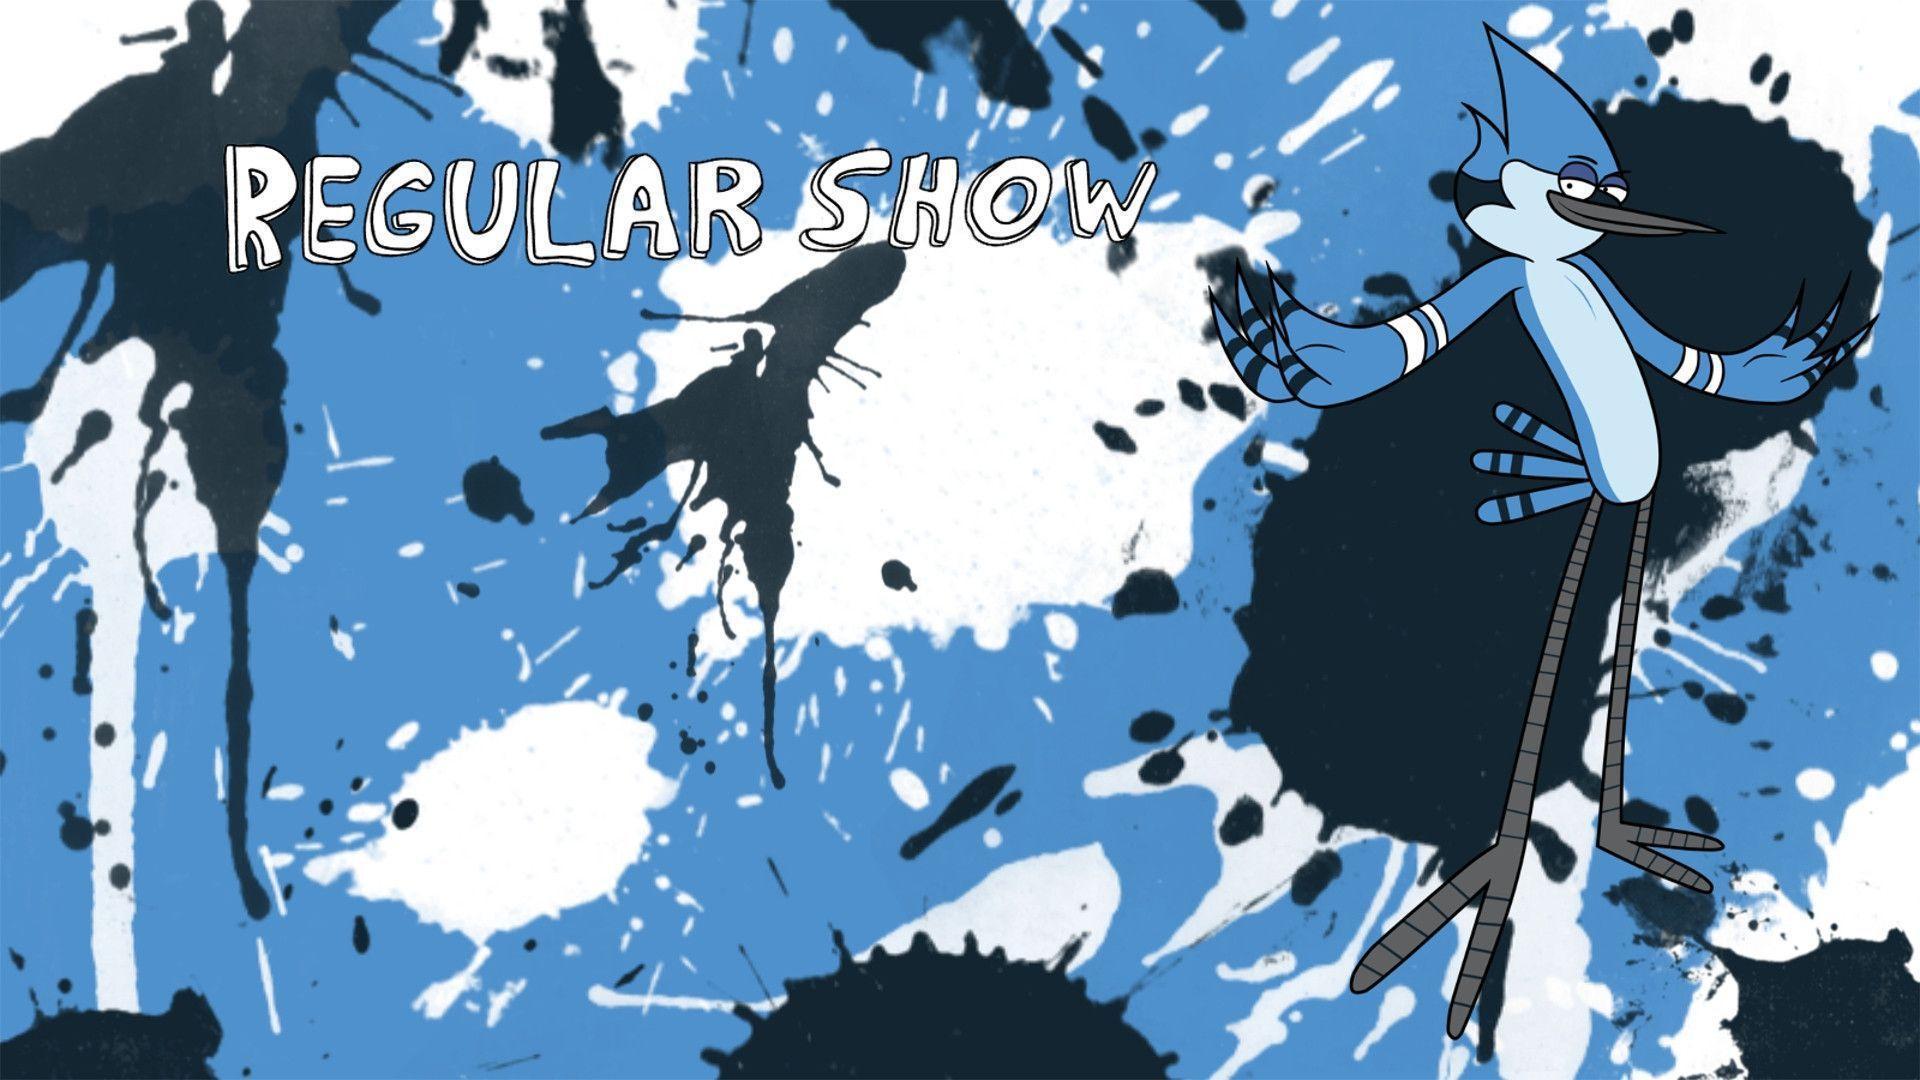 Regular Show Wallpapers